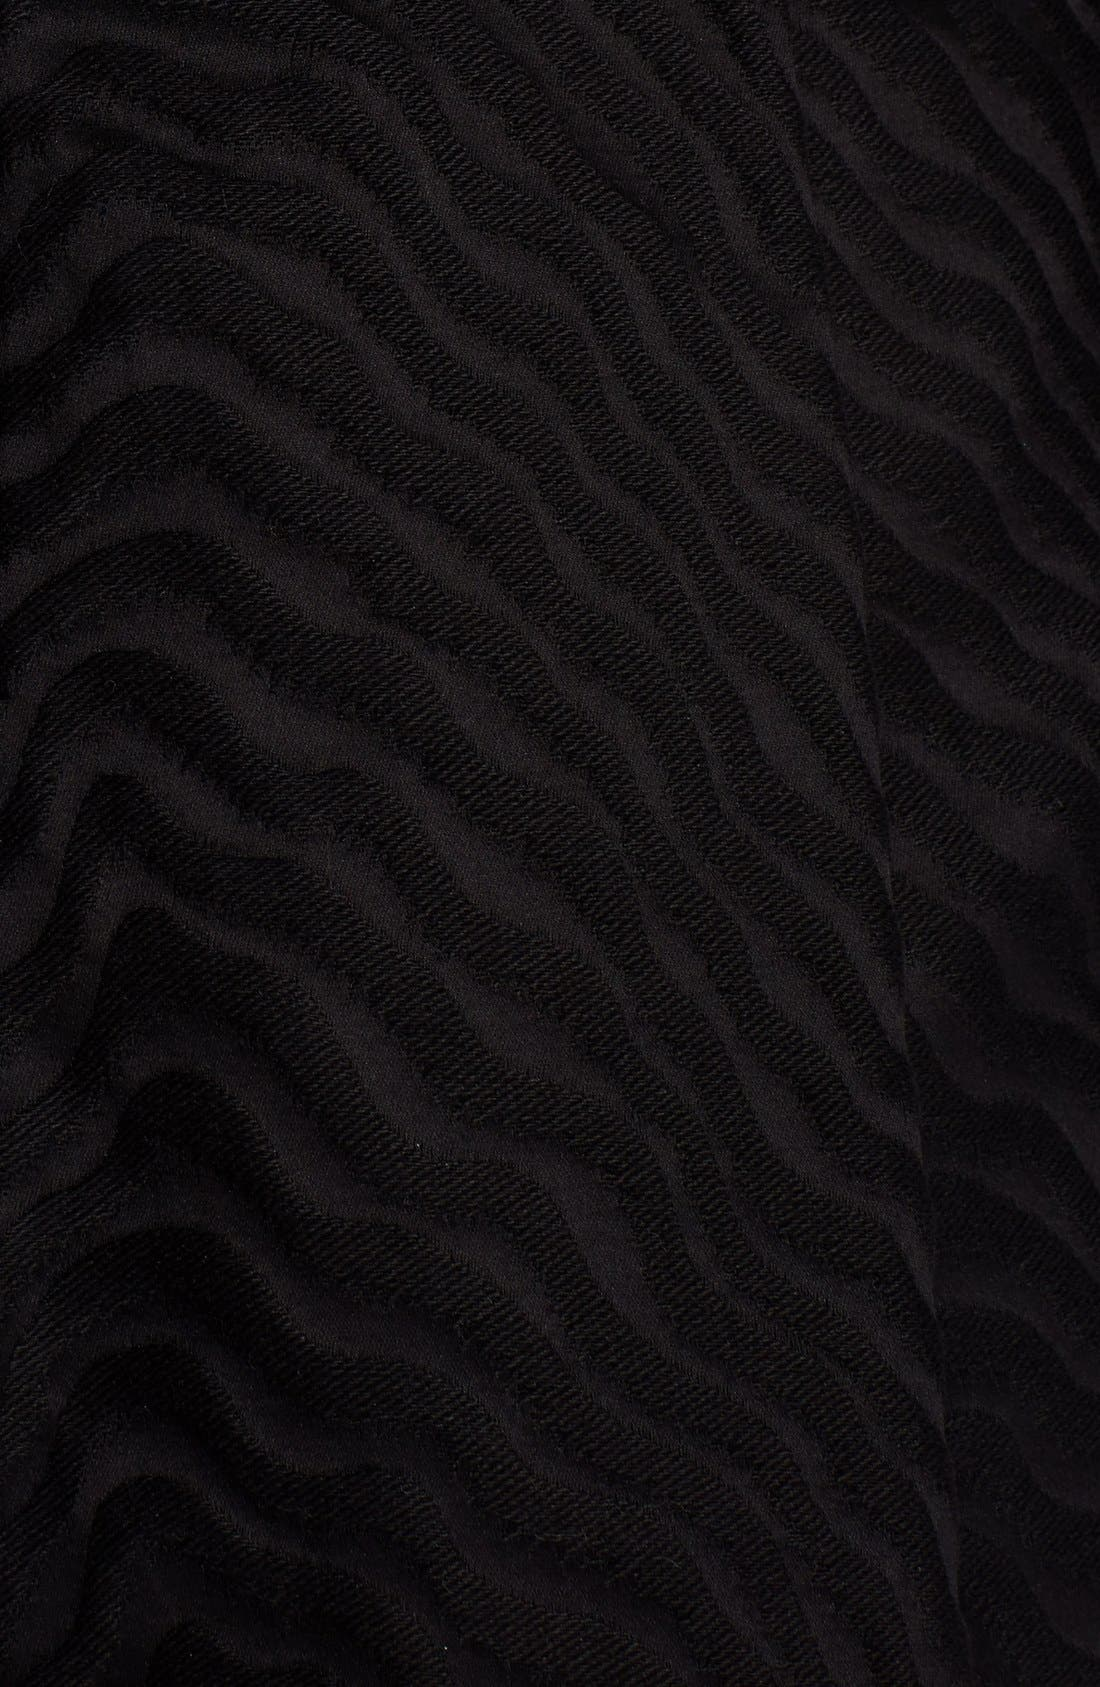 Alternate Image 3  - Jason Wu Jacquard Fit & Flare Dress